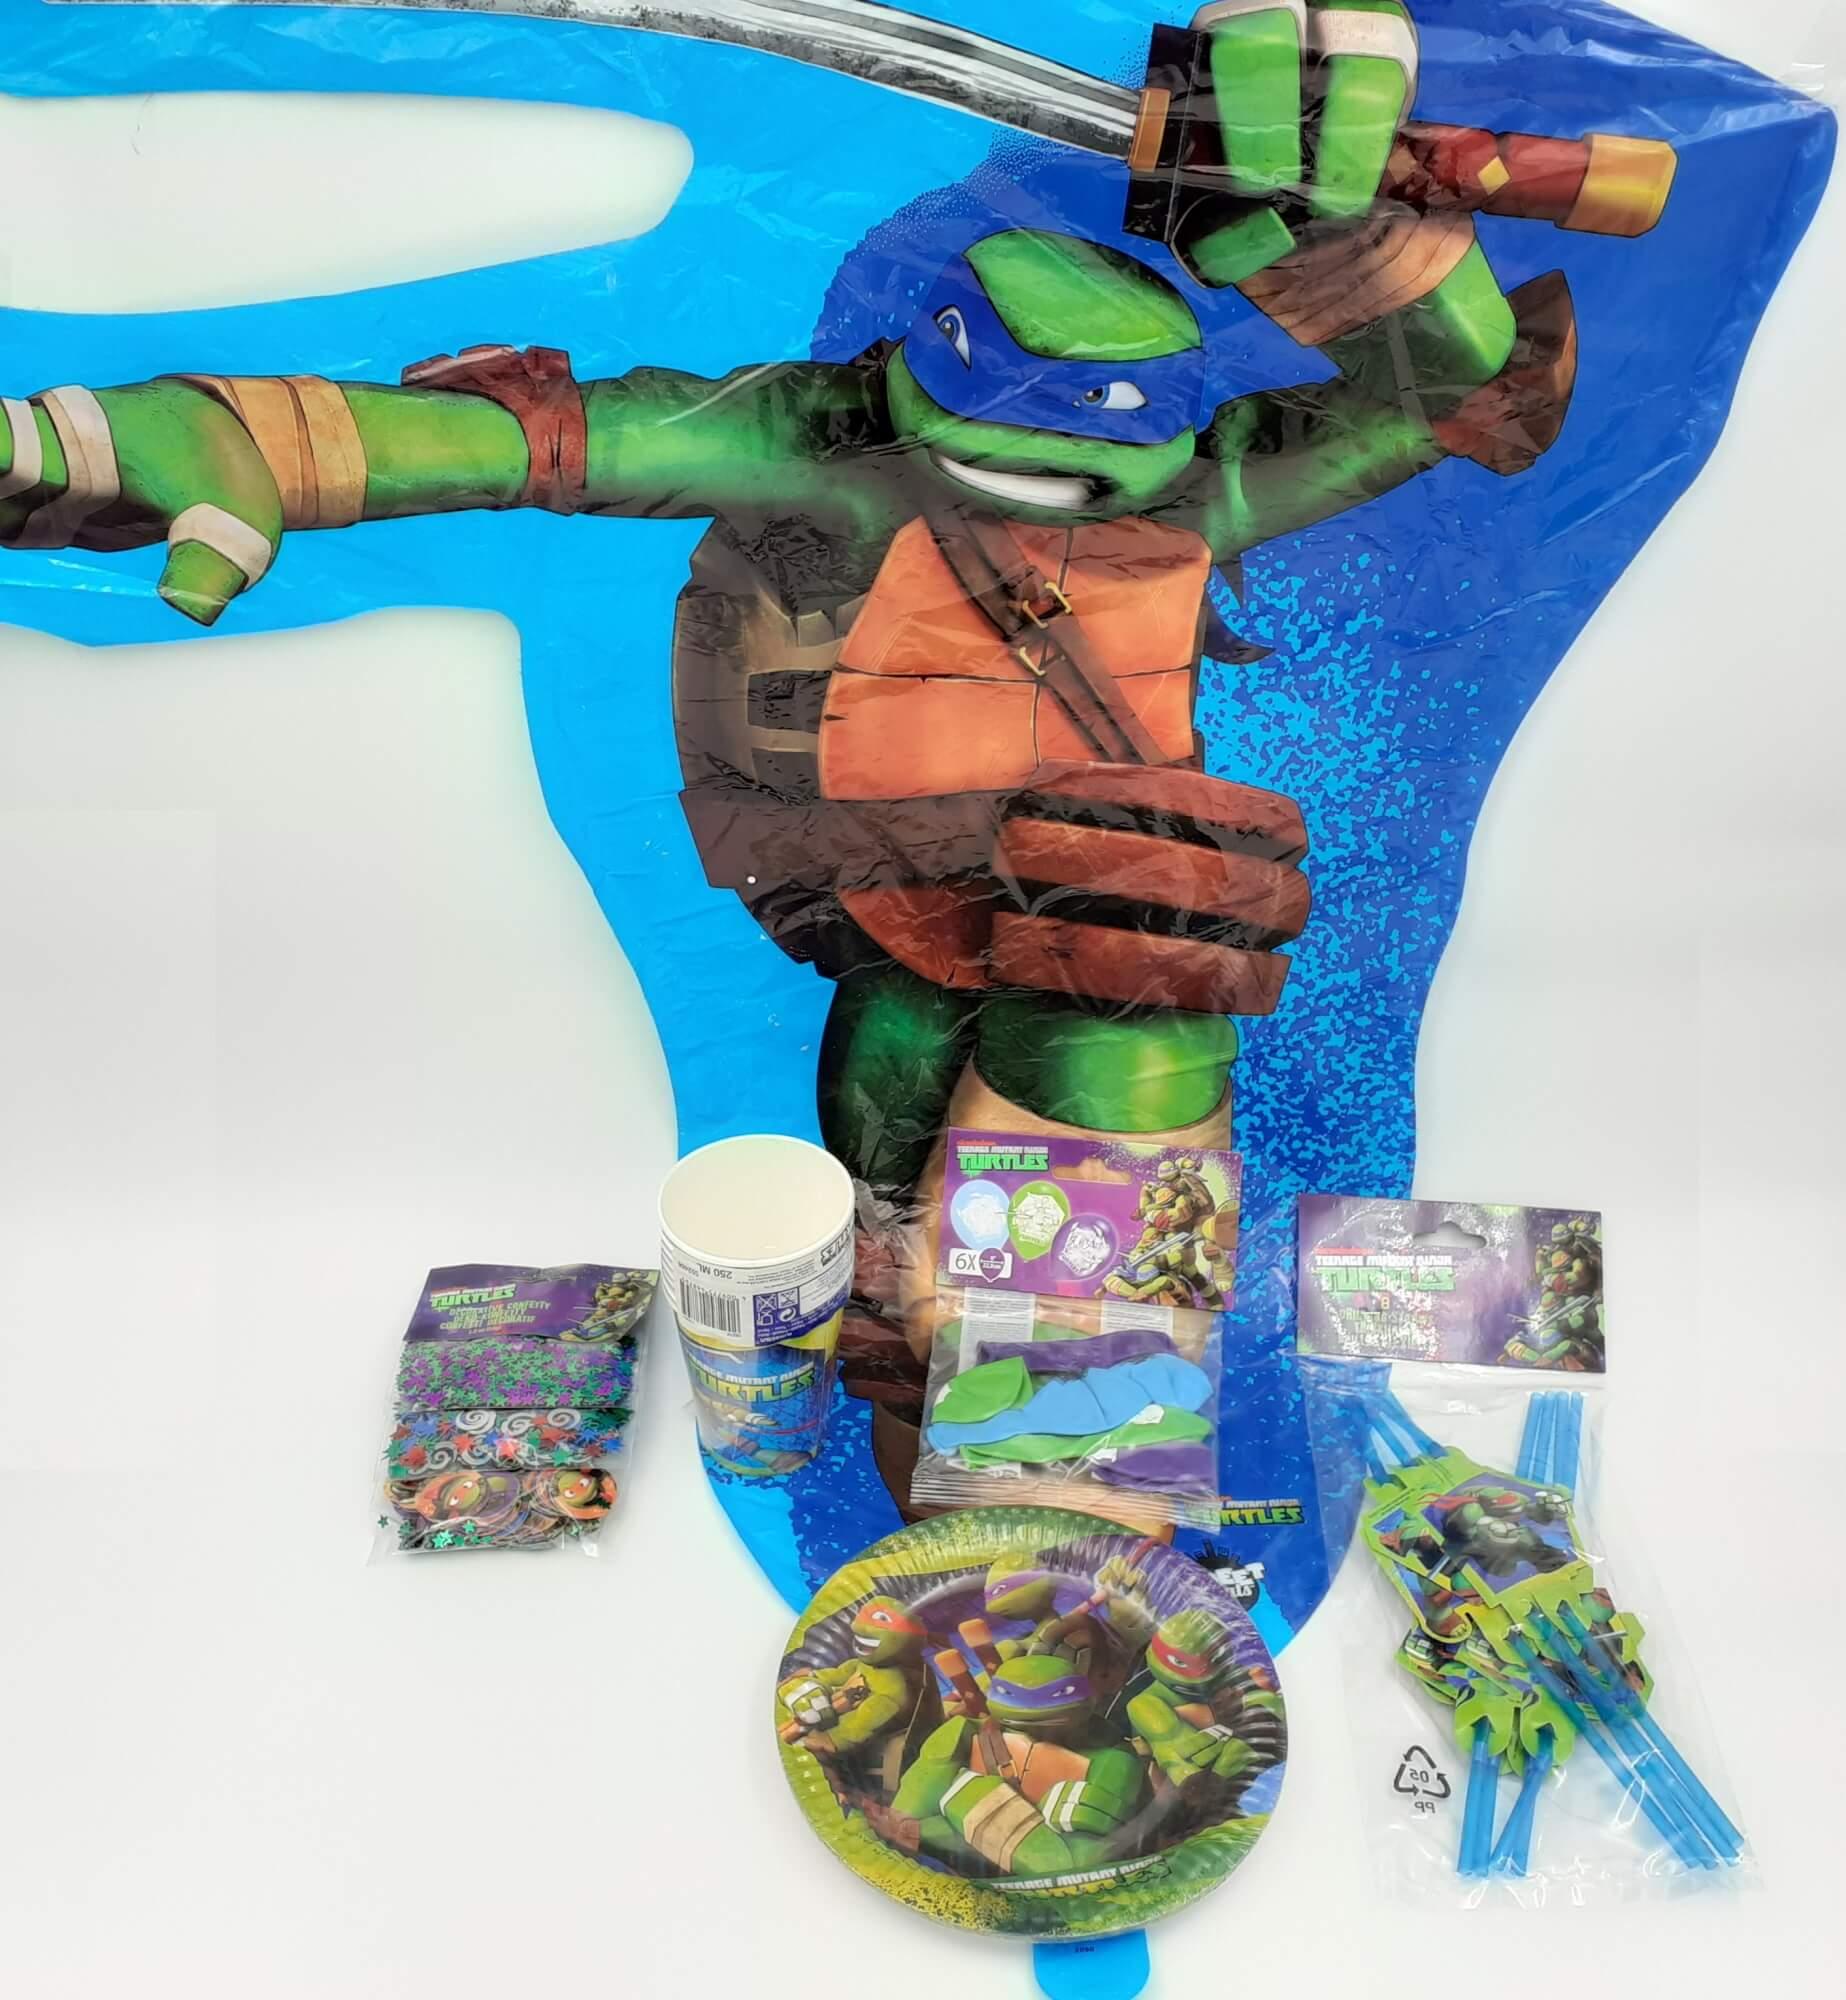 Ninja Turtles Nindža Kornjače party SET 6 u 1